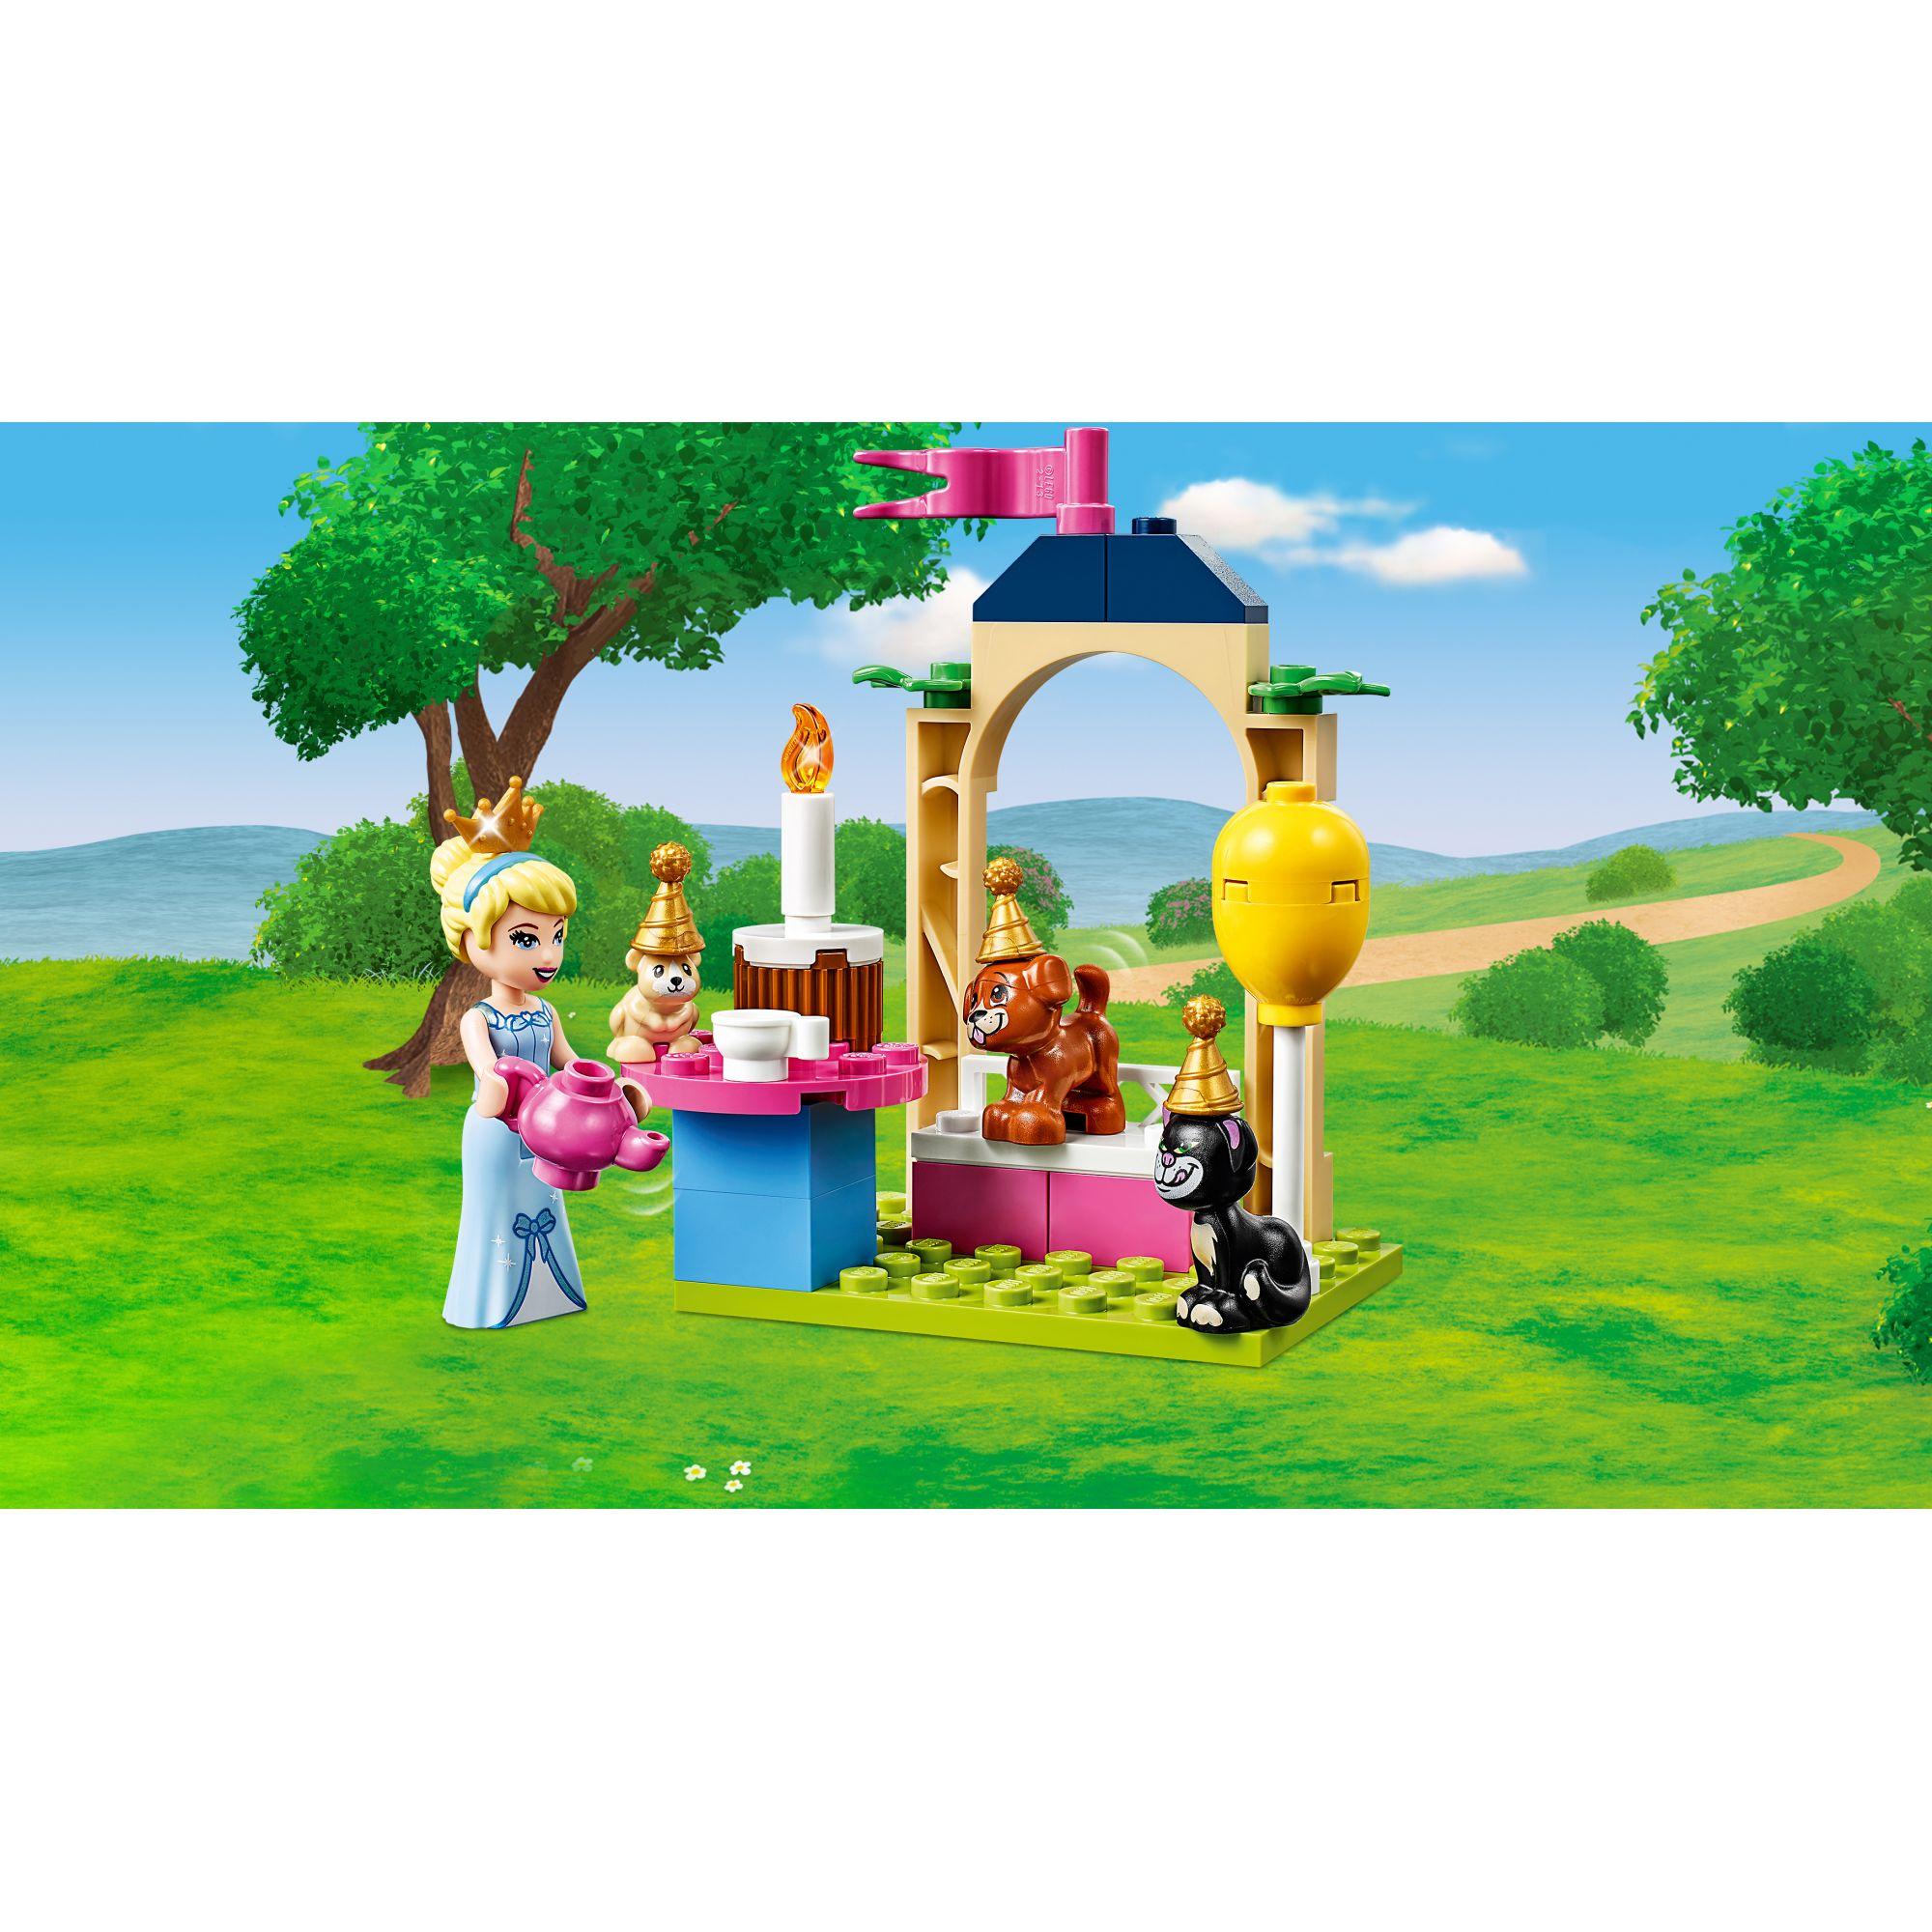 LEGO Disney Princess La festa al castello di Cenerentola - 43178